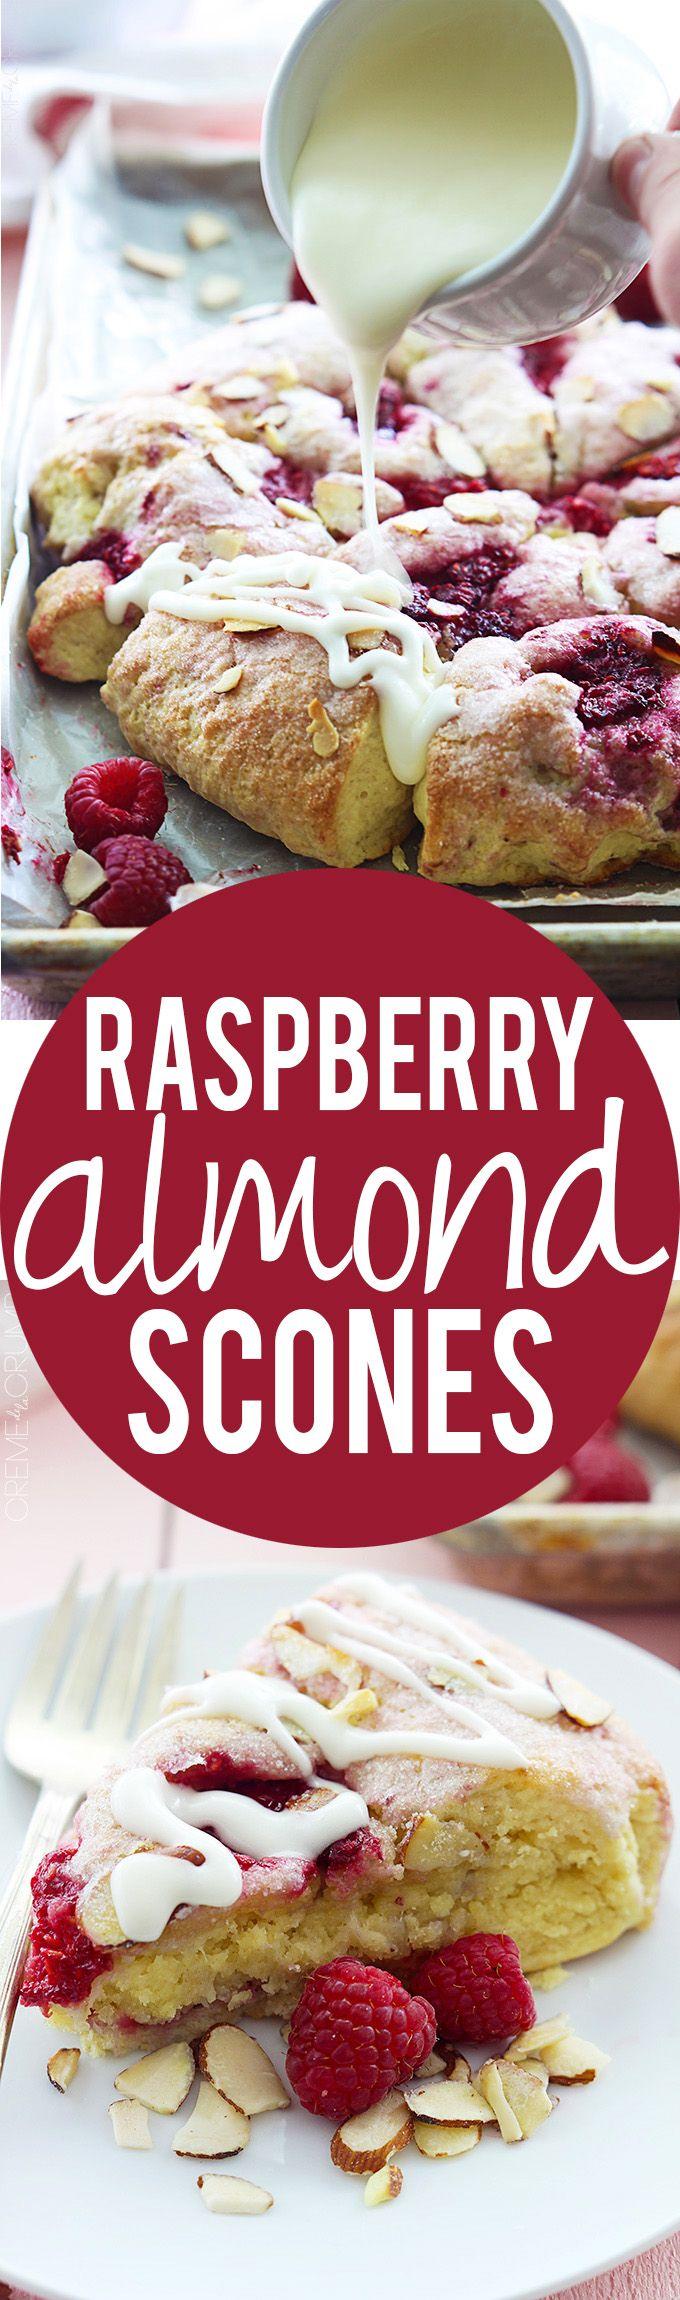 Raspberry Almond Scones | Creme de la Crumb